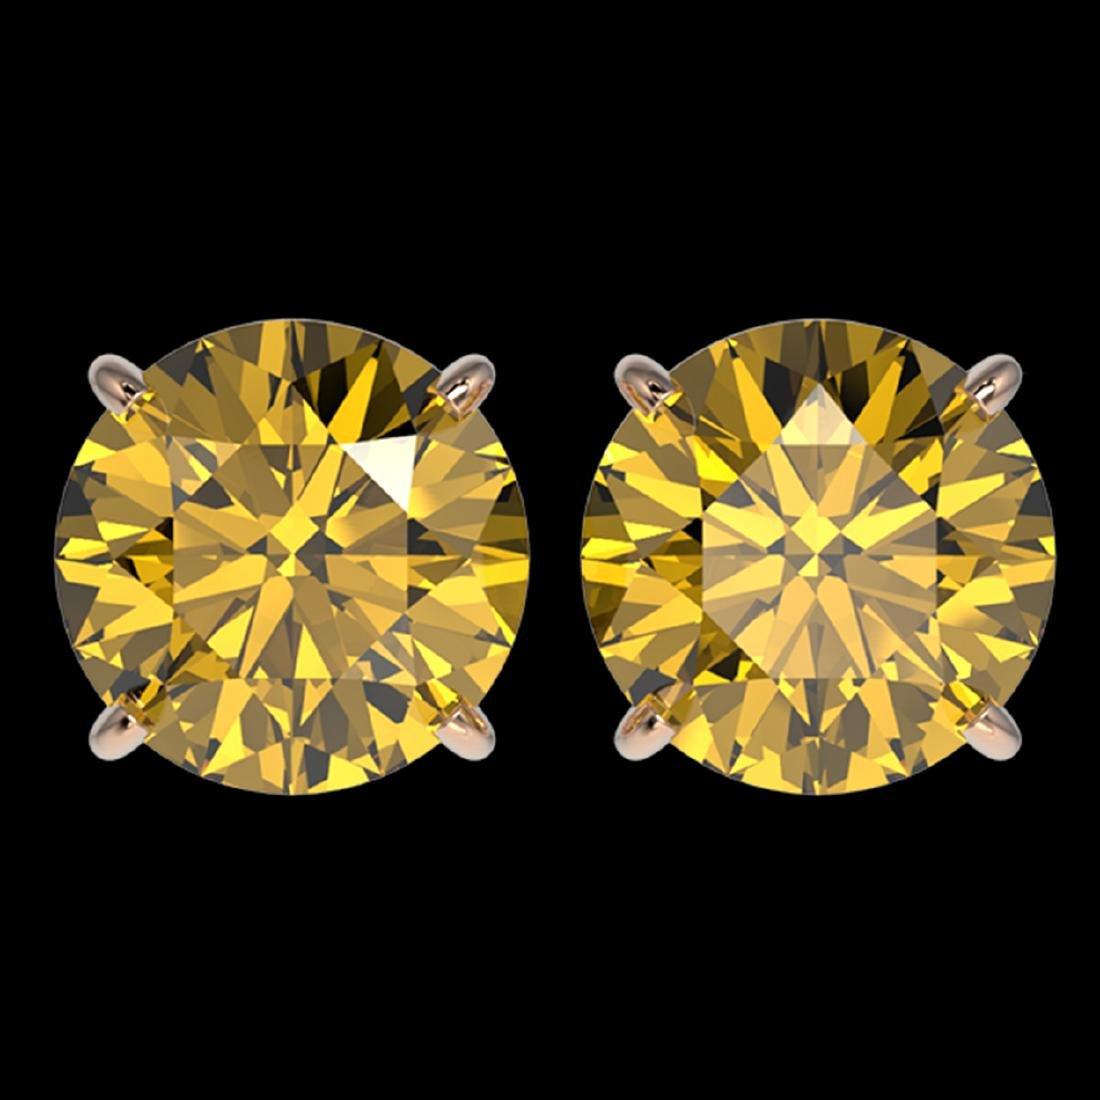 4 ctw Intense Yellow Diamond Stud Earrings 10K Rose